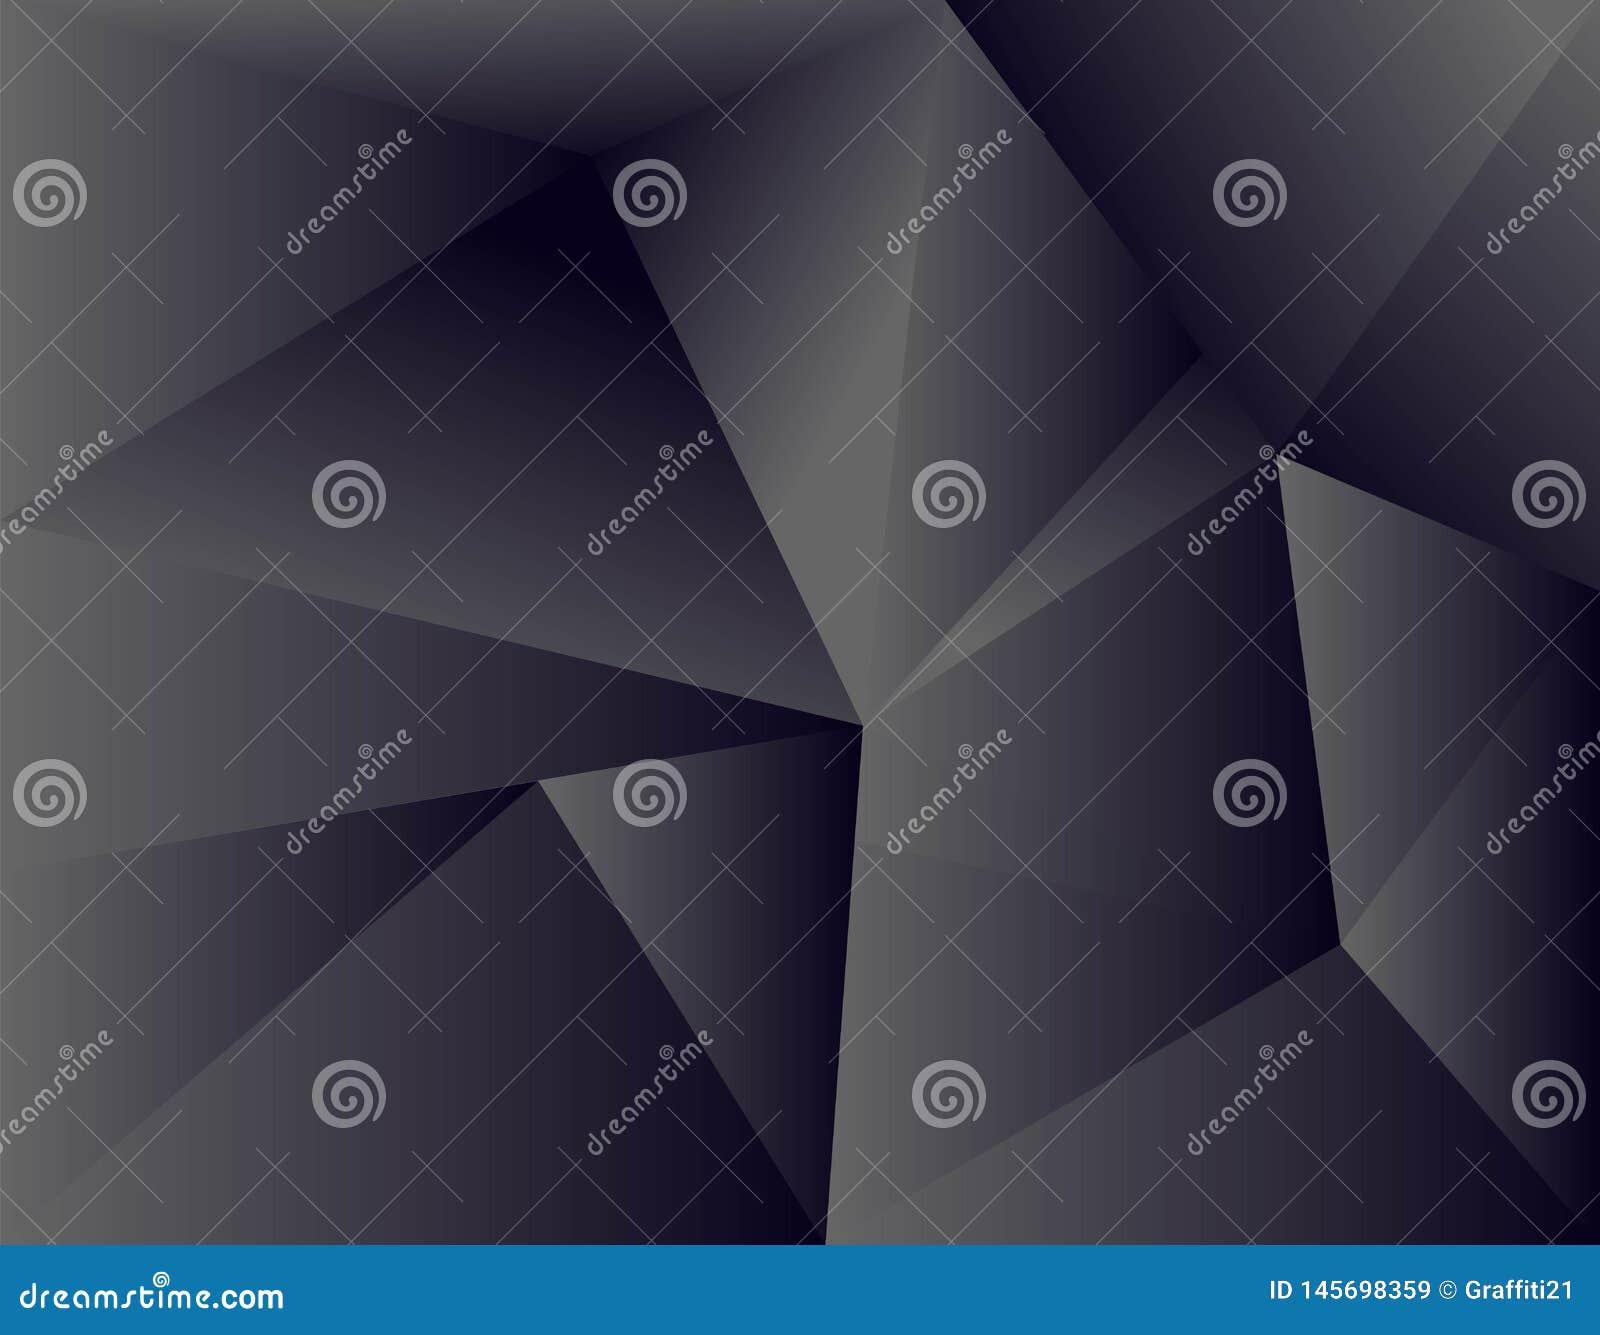 Black background overlap dimension grey vector illustration message board for text and message design modern website